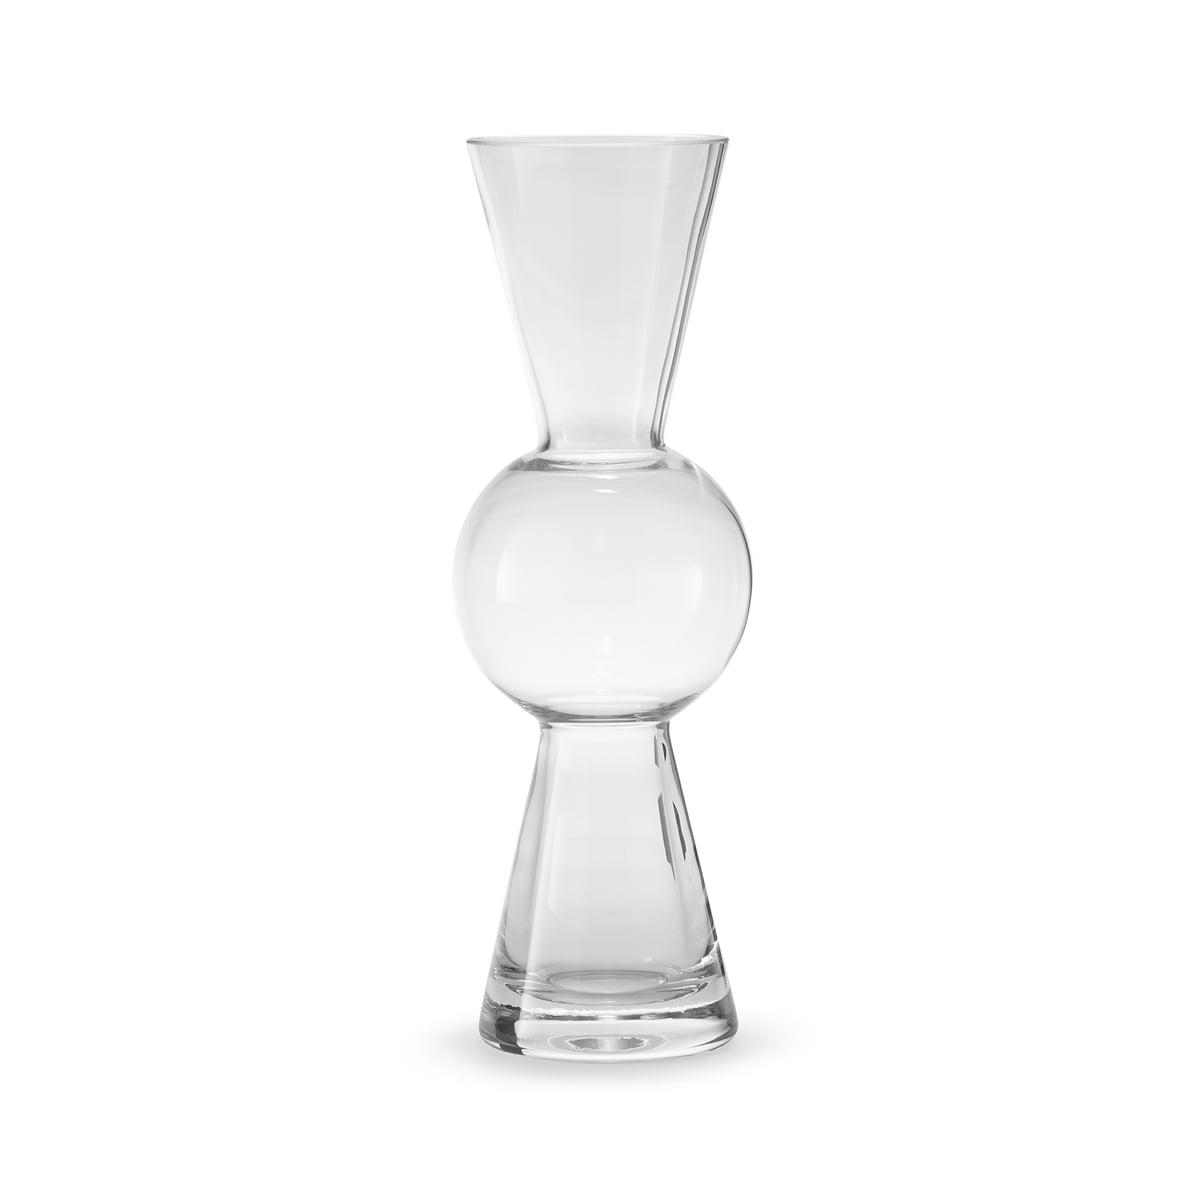 Design house stockholm bon bon vase klar frei